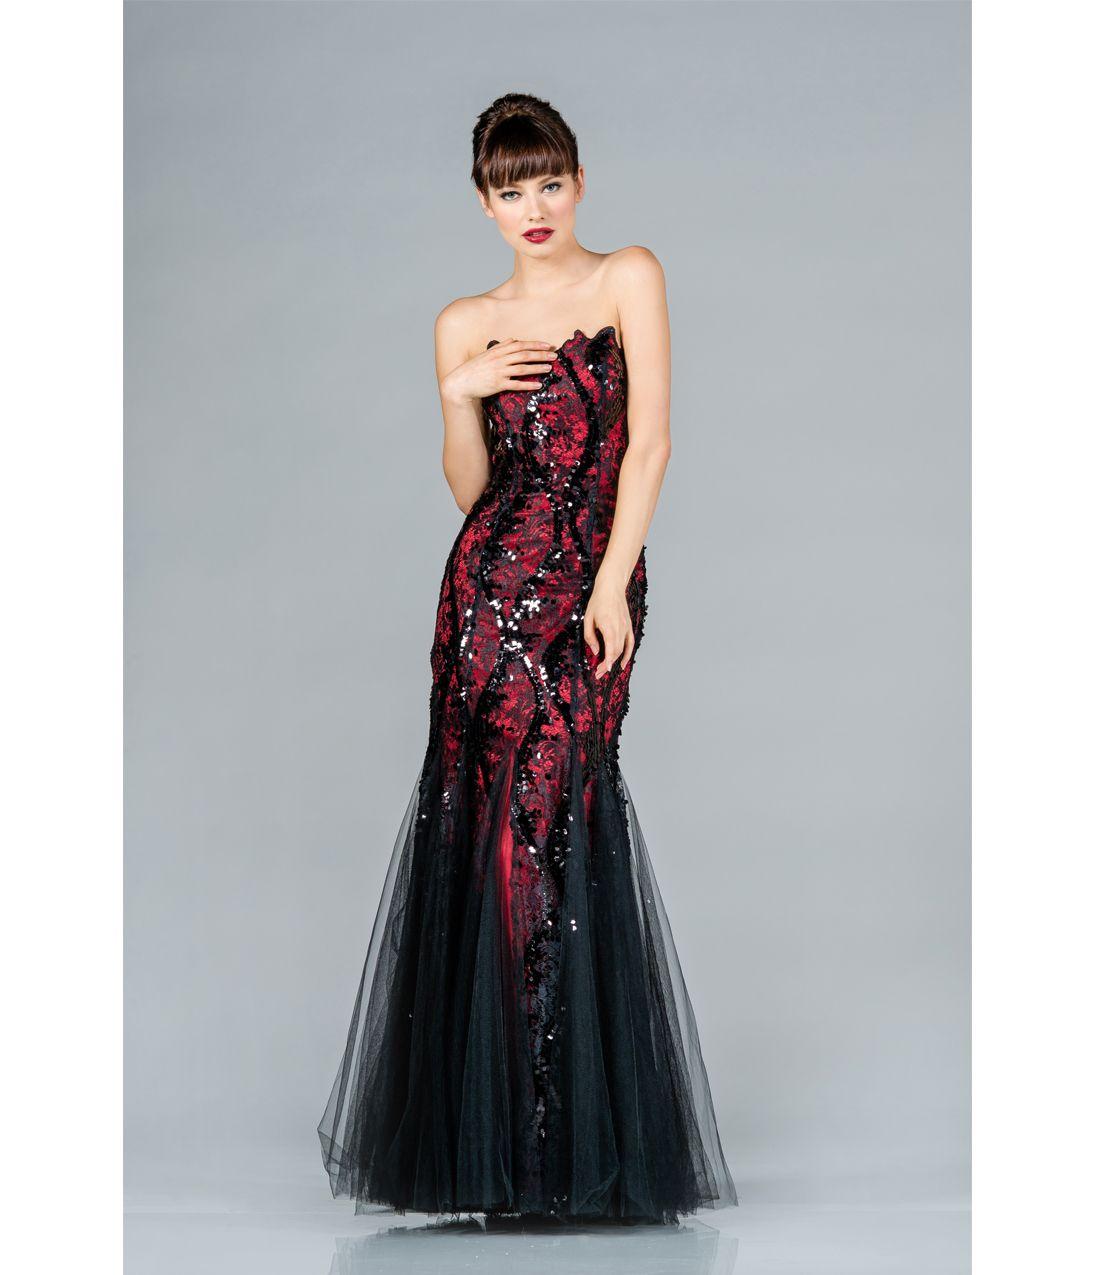 Black & Red Strapless Mermaid Prom Dress | Evening Dresses | Pinterest